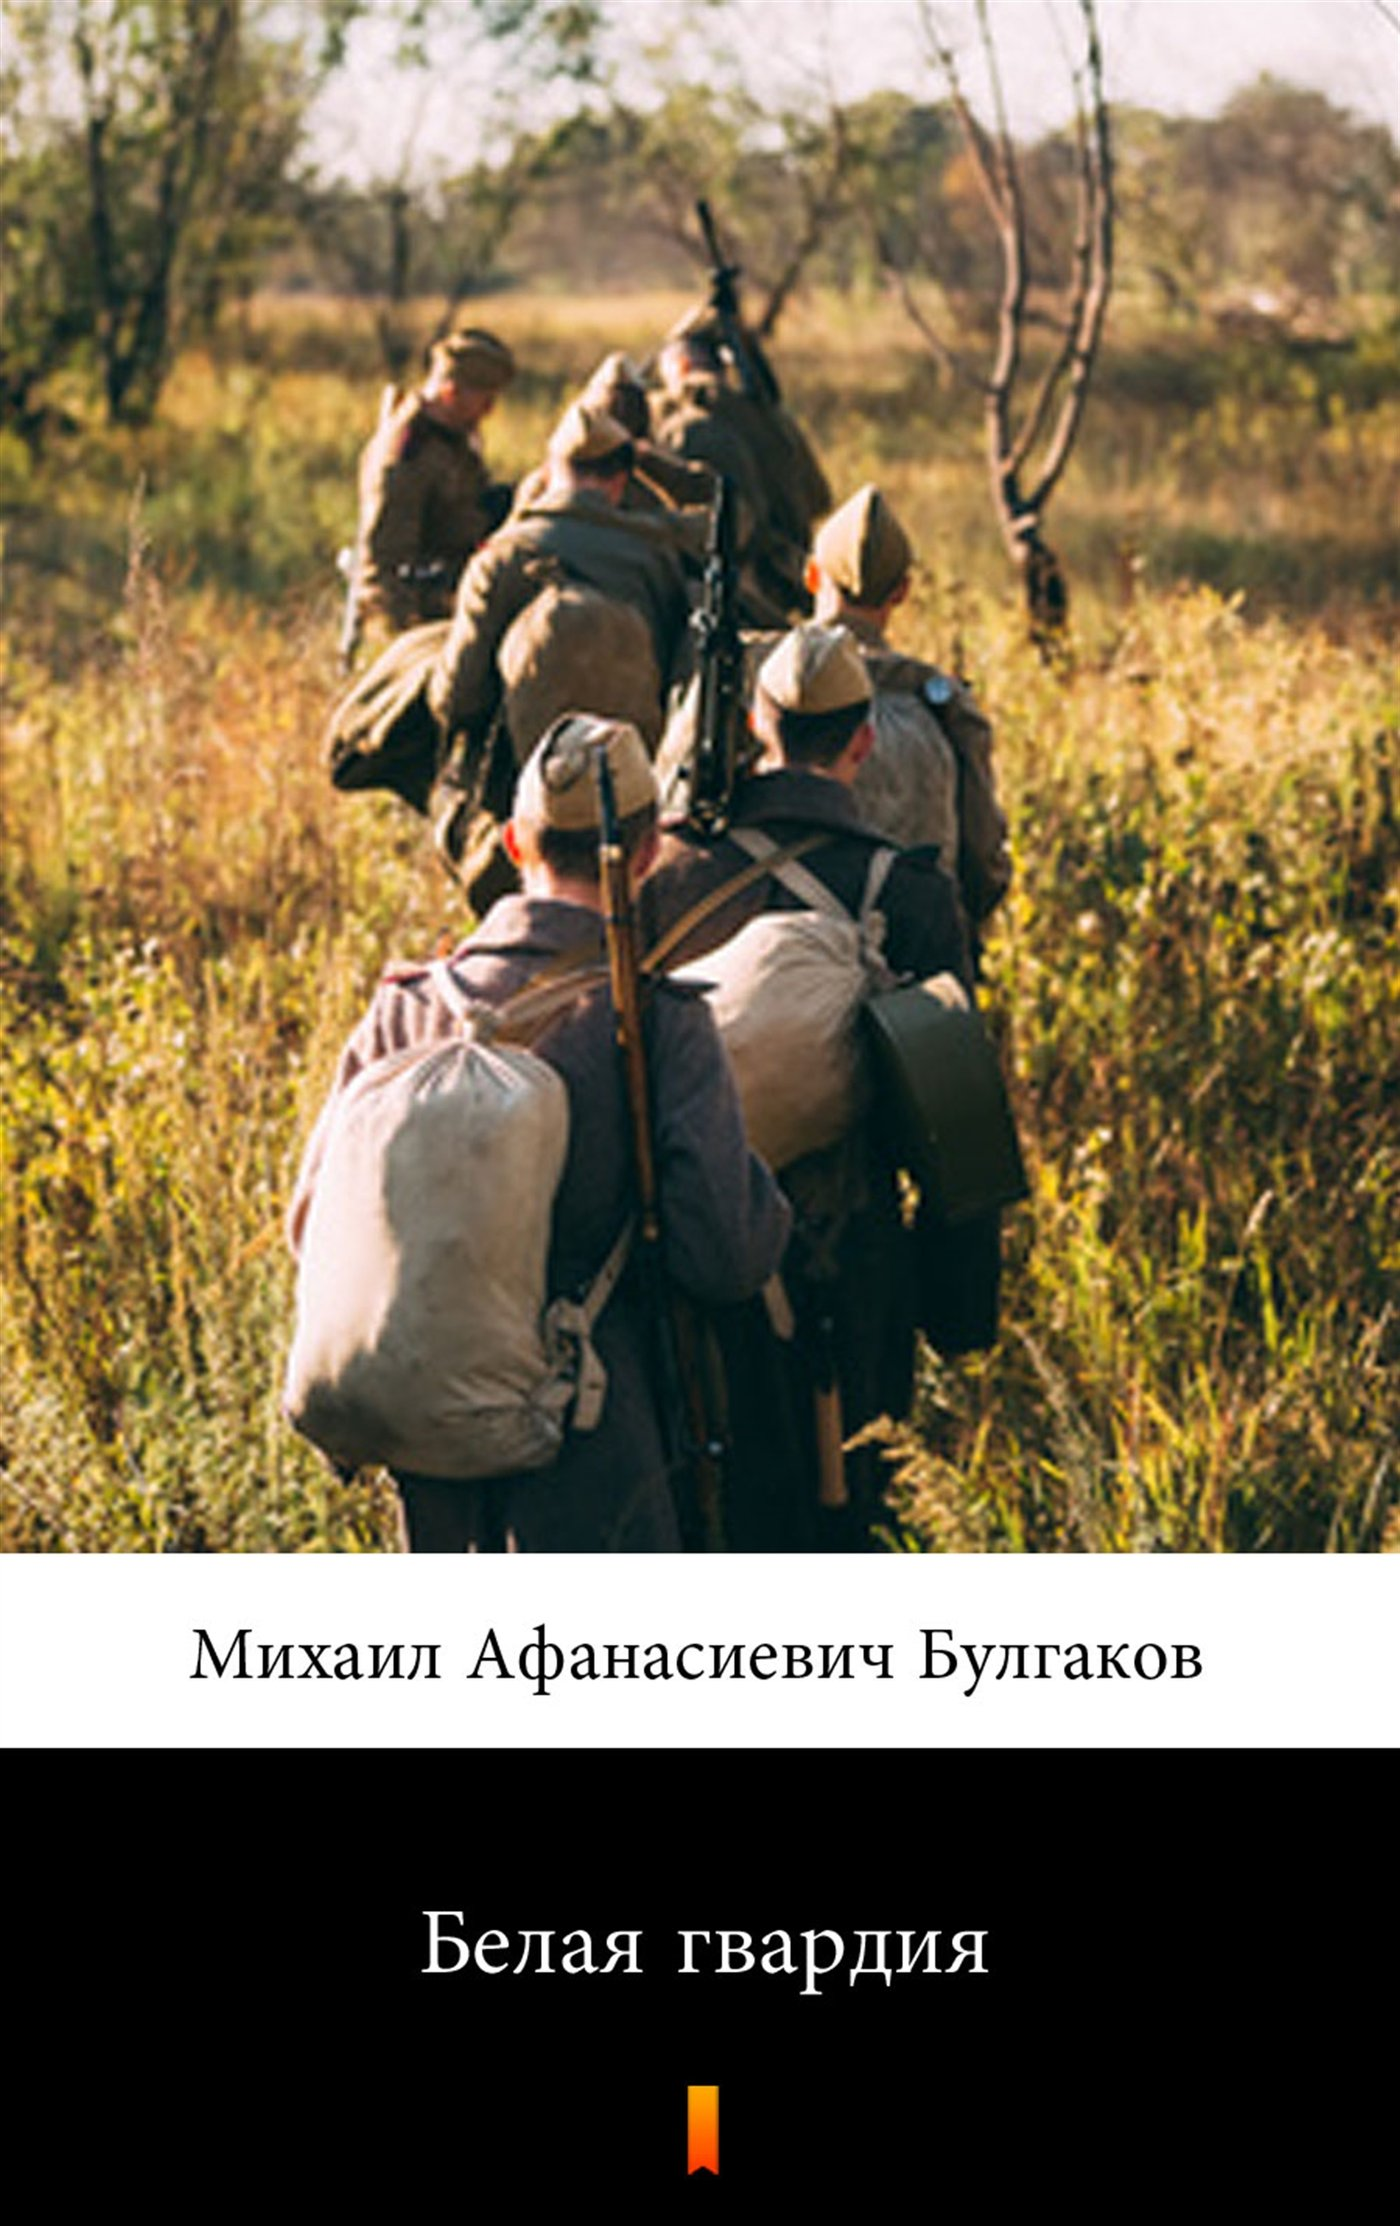 Белая гвардия - Ebook (Książka EPUB) do pobrania w formacie EPUB